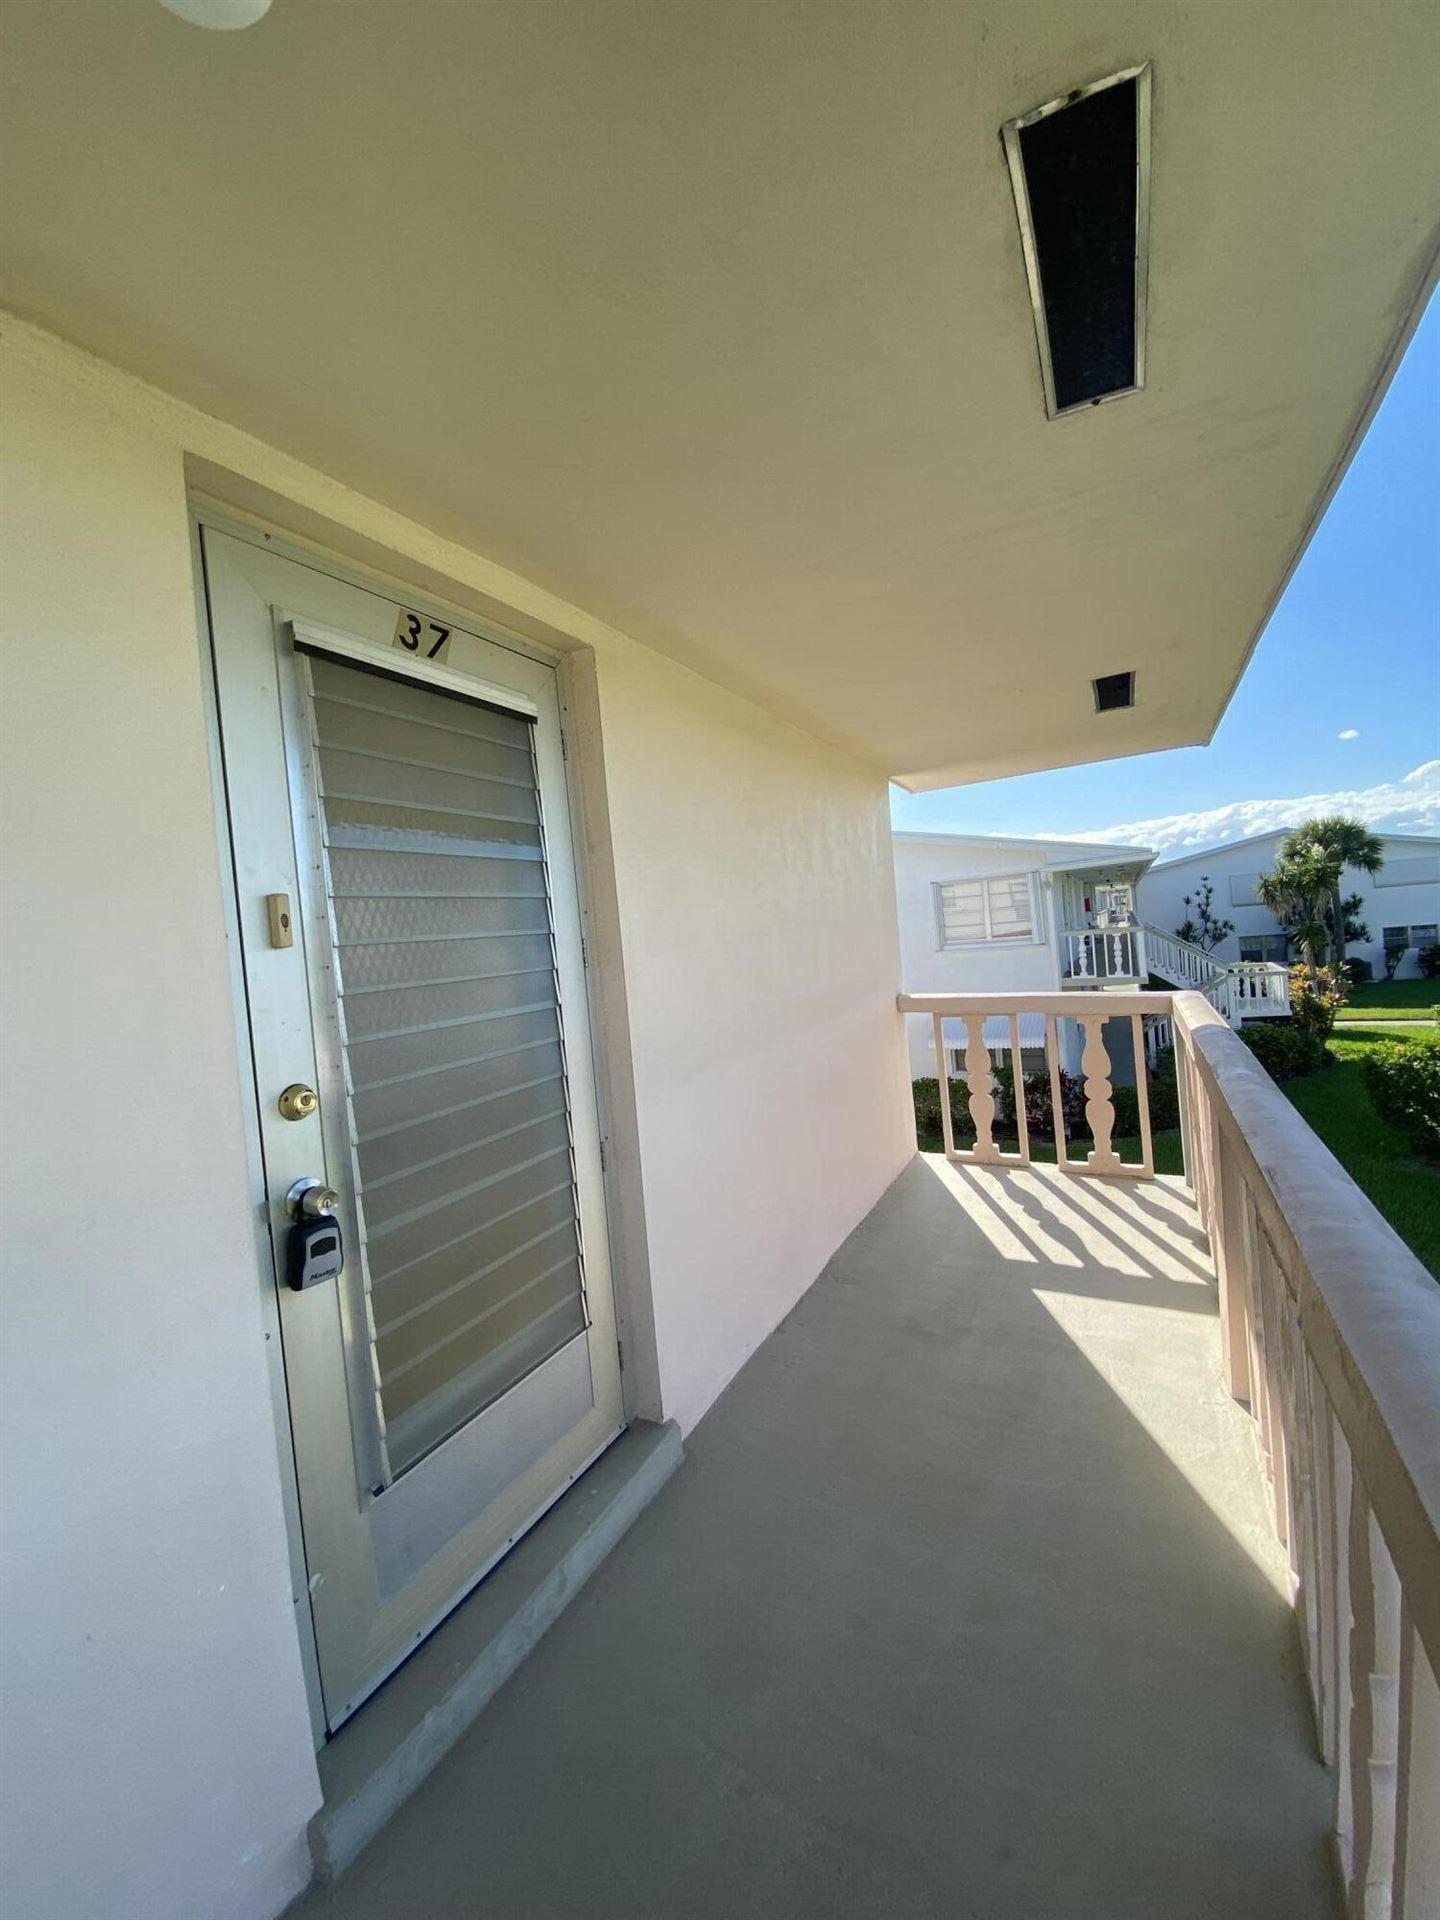 37 Norwich B, West Palm Beach, FL 33417 - MLS#: RX-10749872